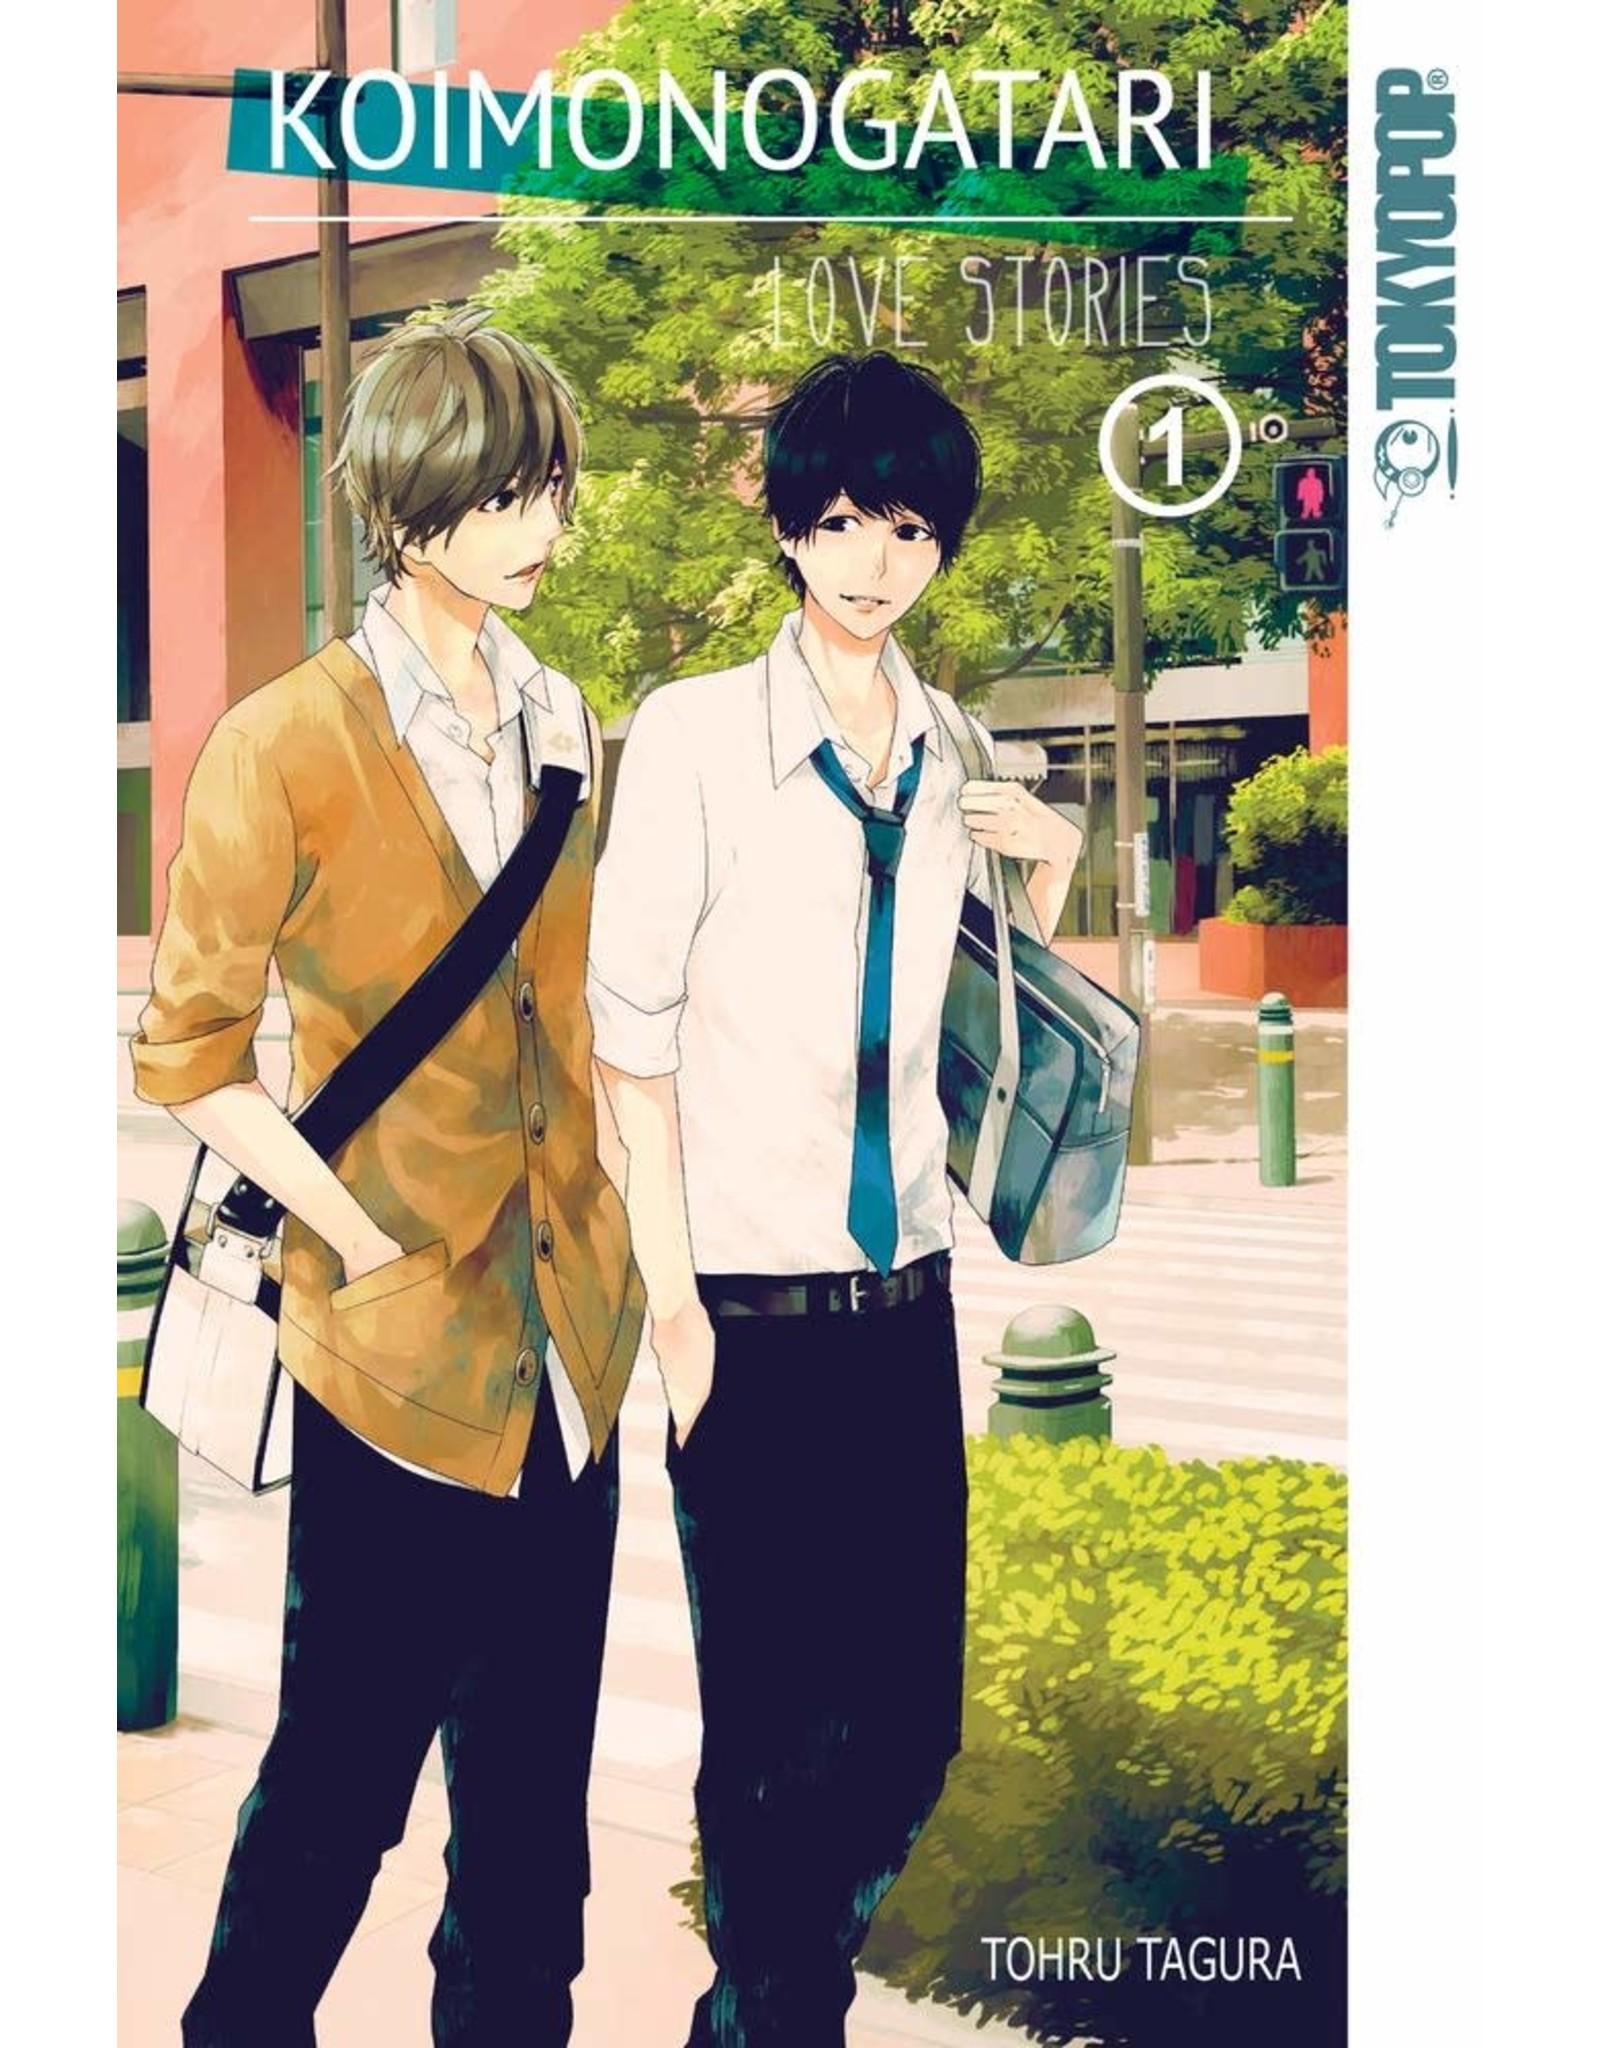 Koimonogatari: Love Stories 1 (English)